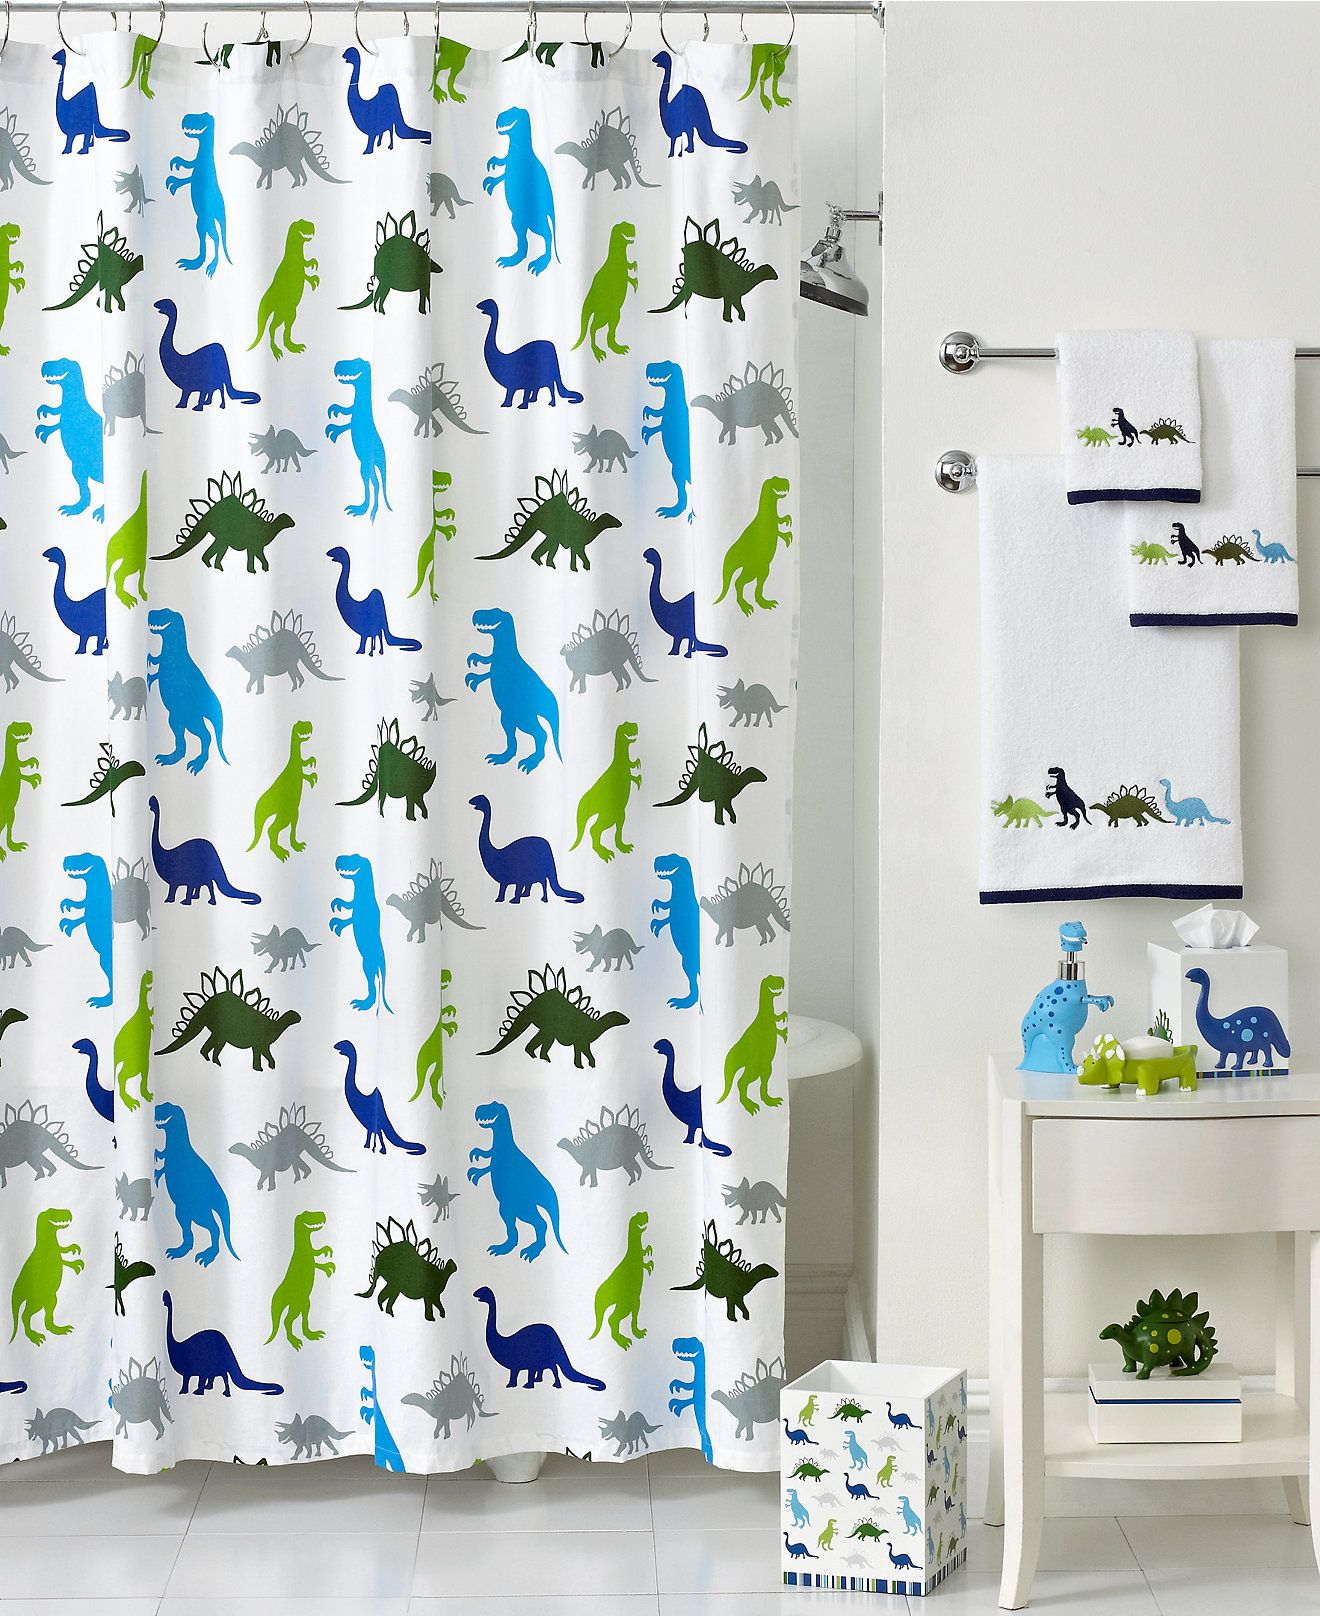 Kassatex Bath, Dino Park Collection - Bathroom Accessories - Bed ...